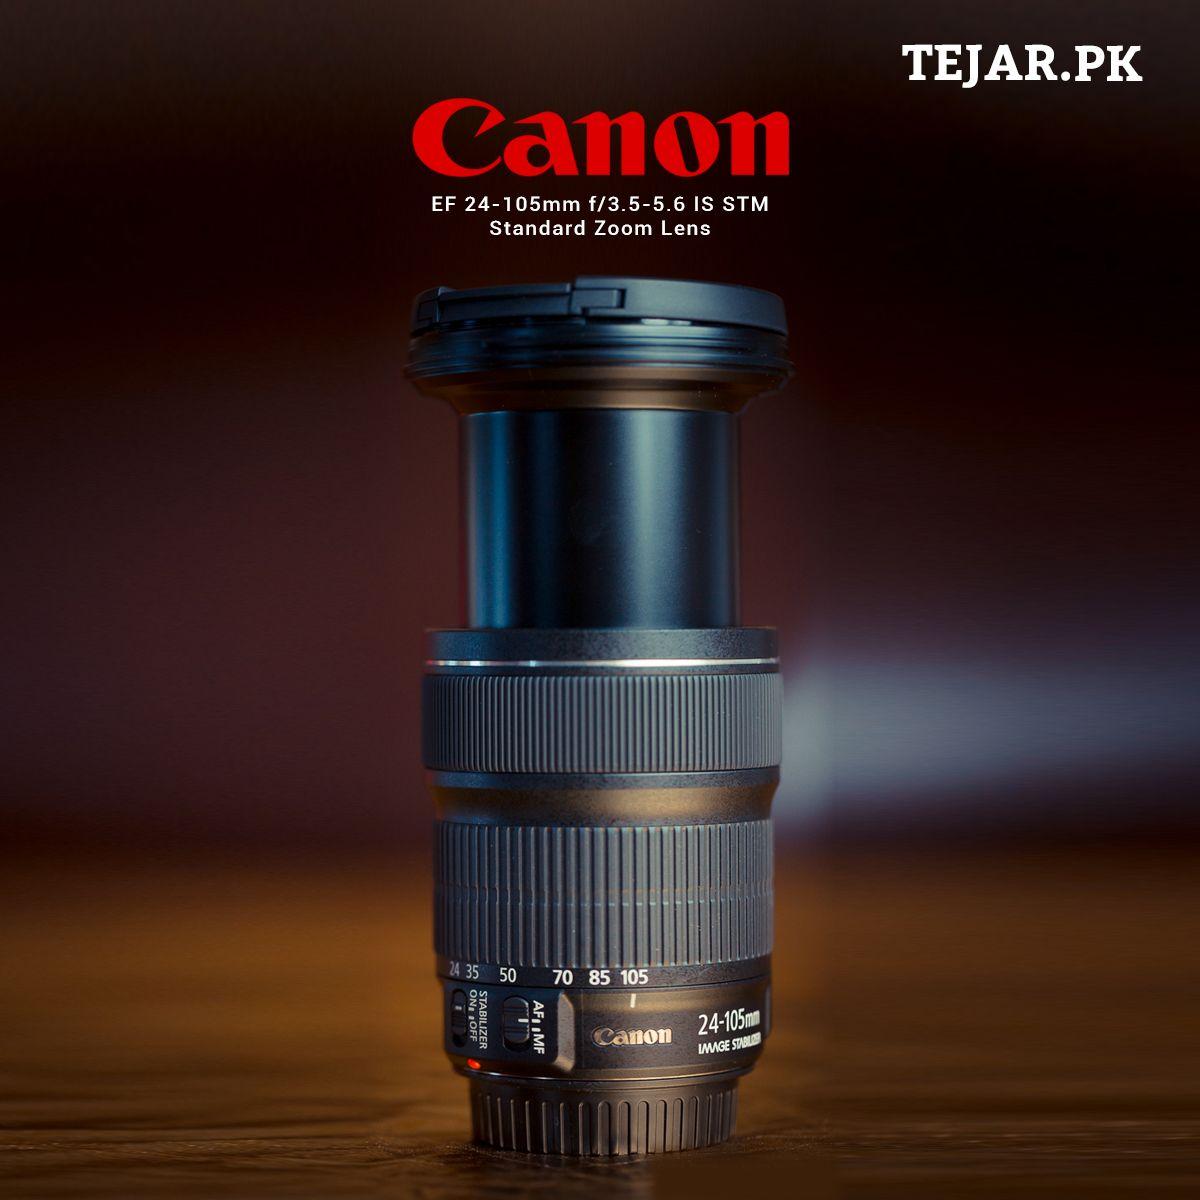 Canon Ef 24 105mm F 3 5 5 6 Is Stm Standard Zoom Lens Zoom Lens Standard Zoom Lens Canon Ef